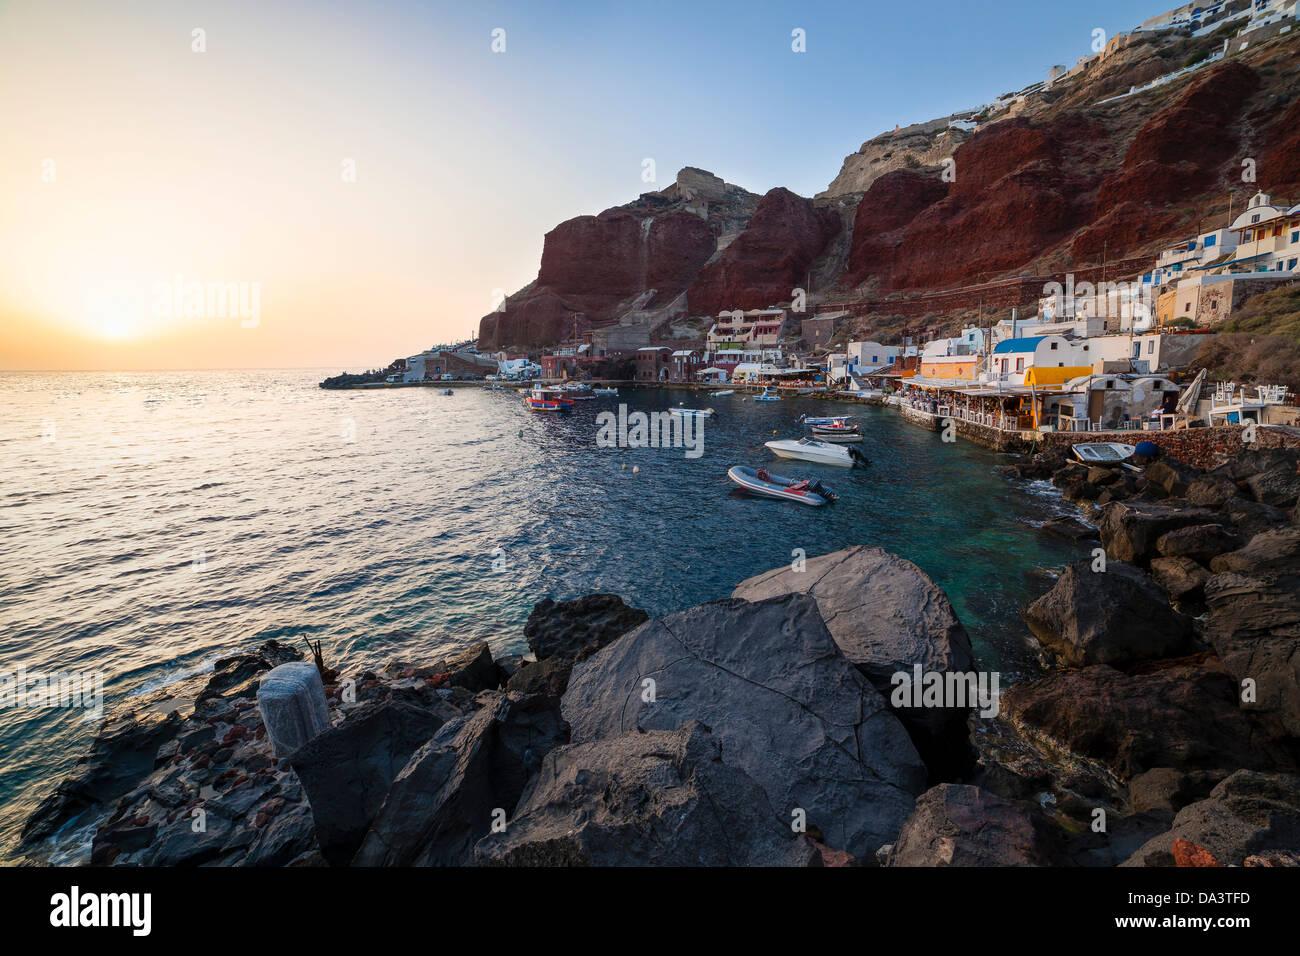 Coucher de soleil à Oia Santorini Grèce Baie Ammoudi Photo Stock